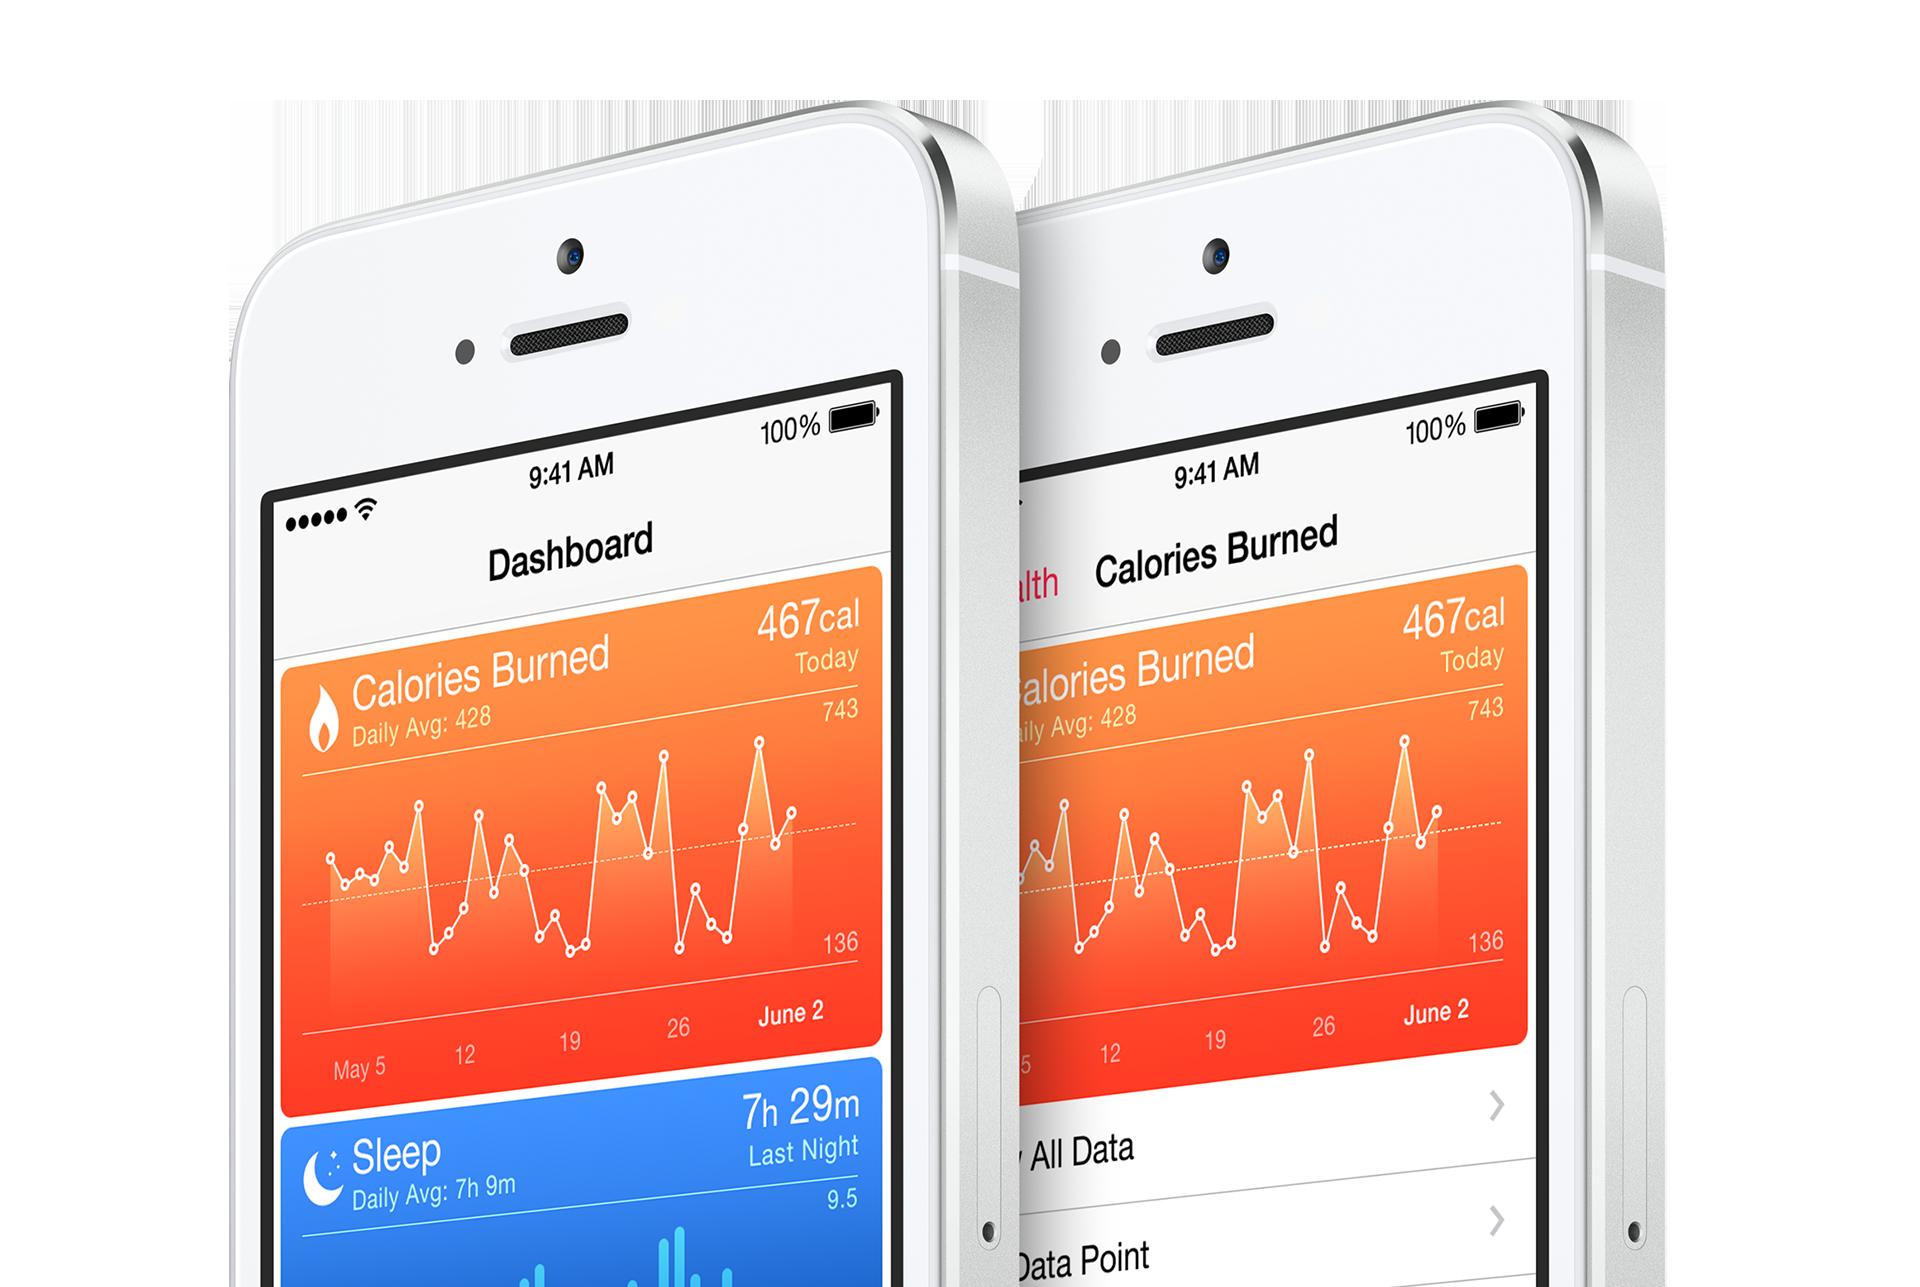 Apple's move to tighten digital health criteria could have bigger impact than FDA